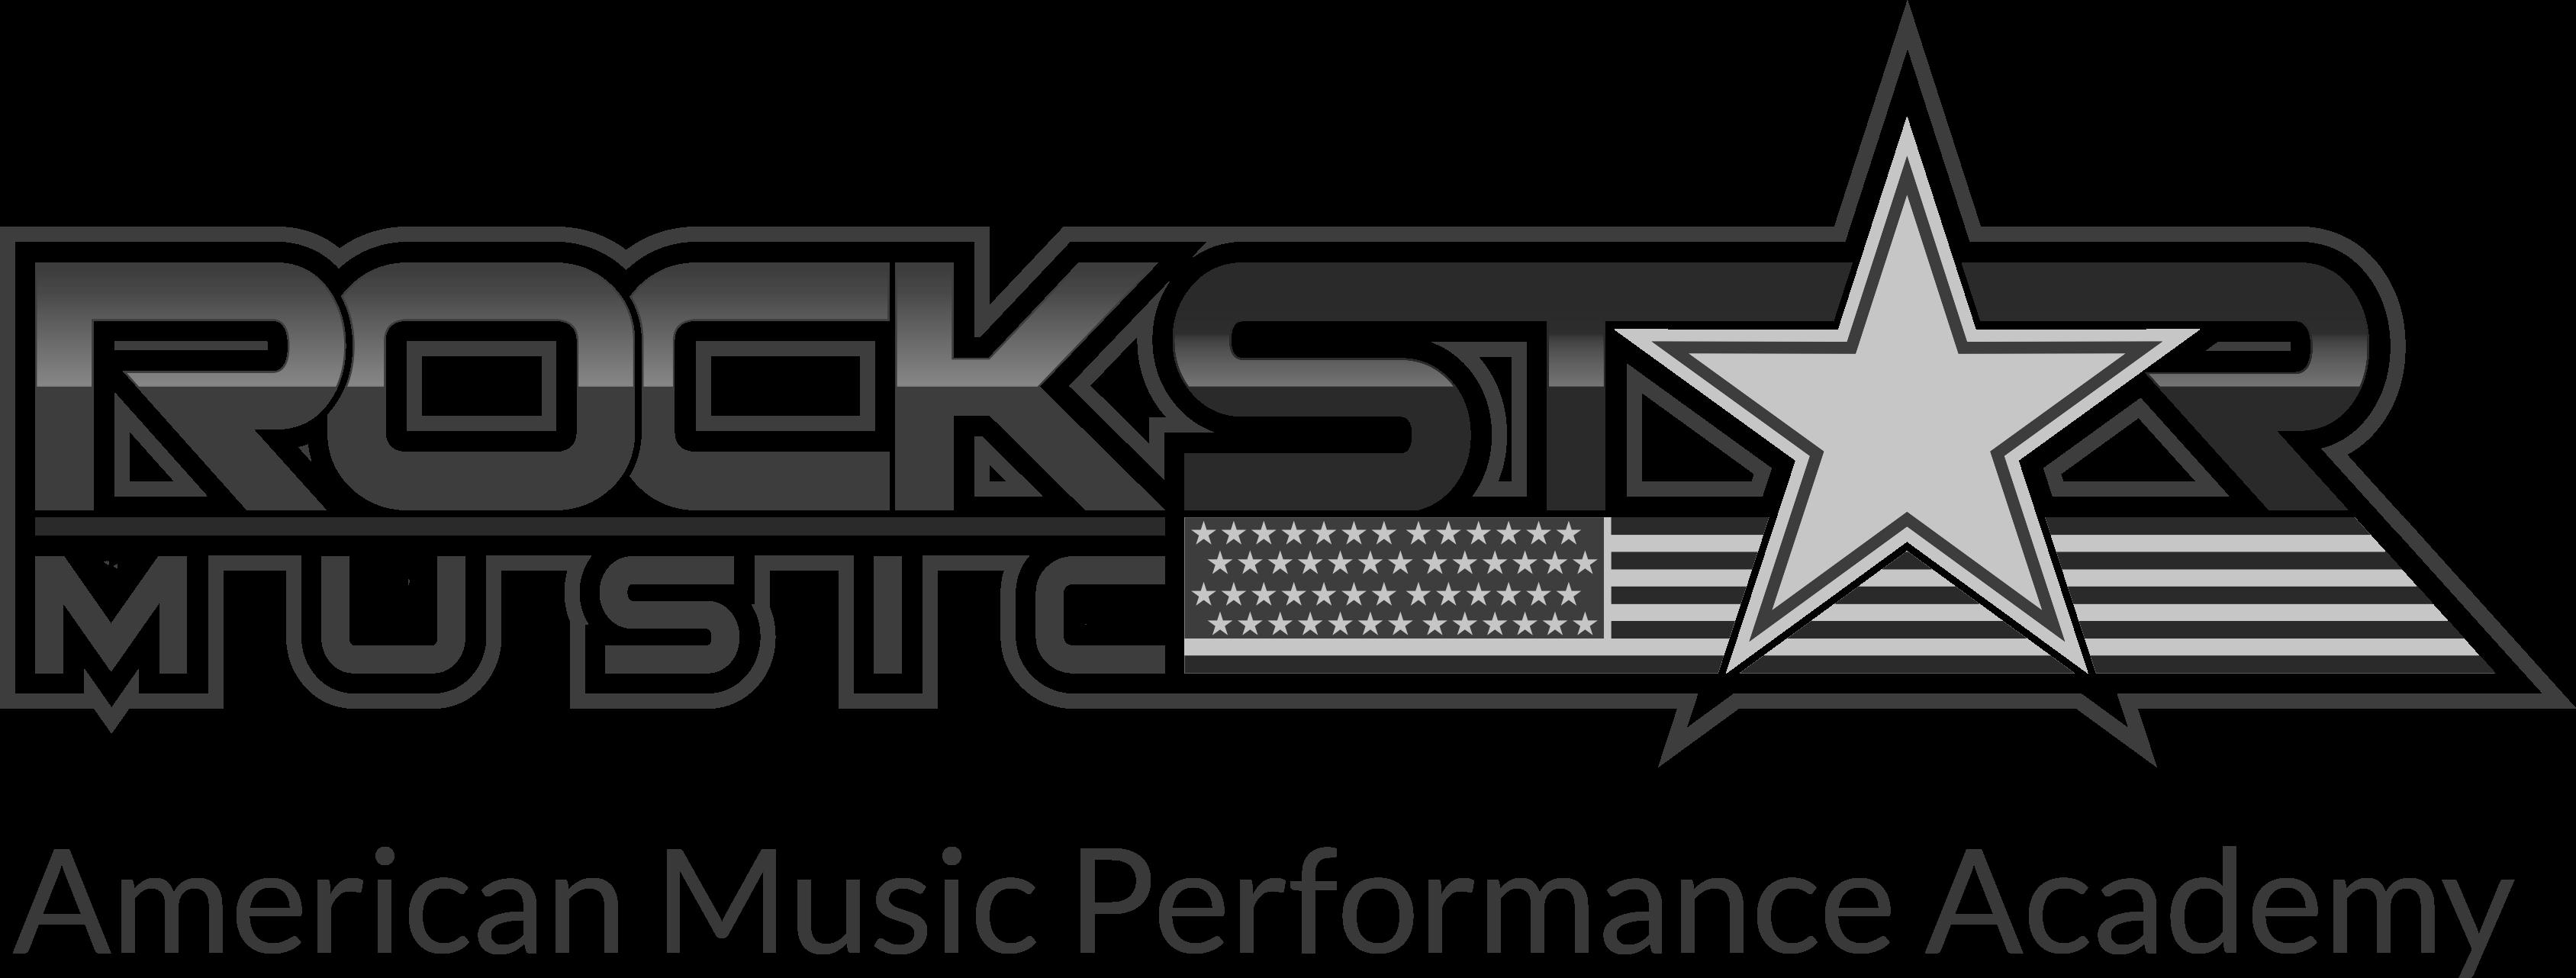 Rockstar Music Logo